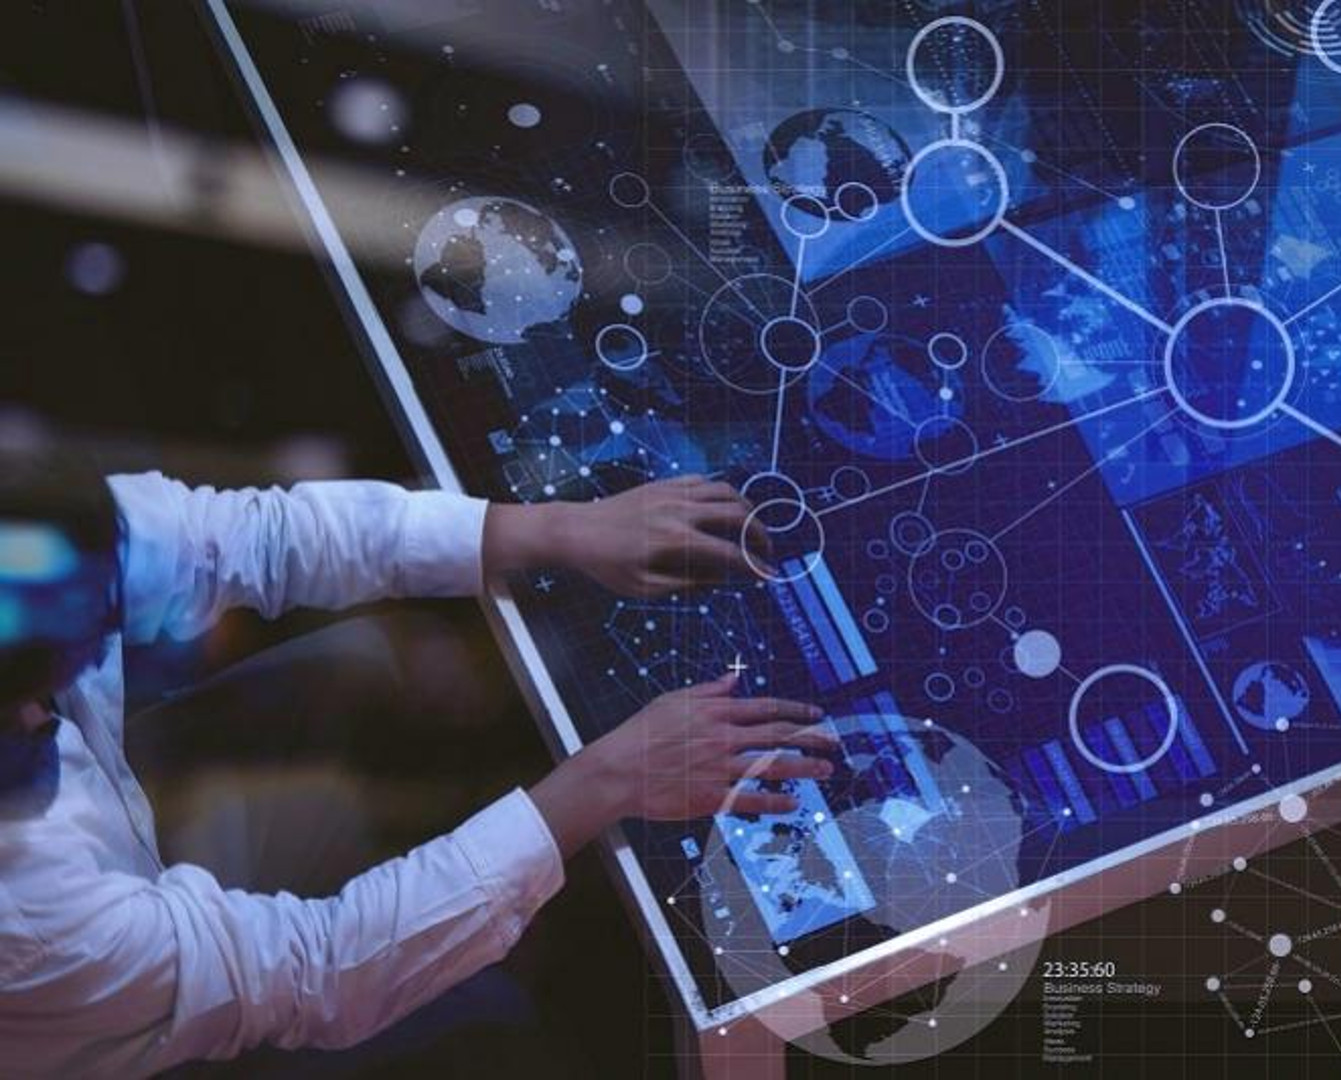 Амбициозная цифровизация: в IT-сферу влили за год более 118 миллиардов тенге